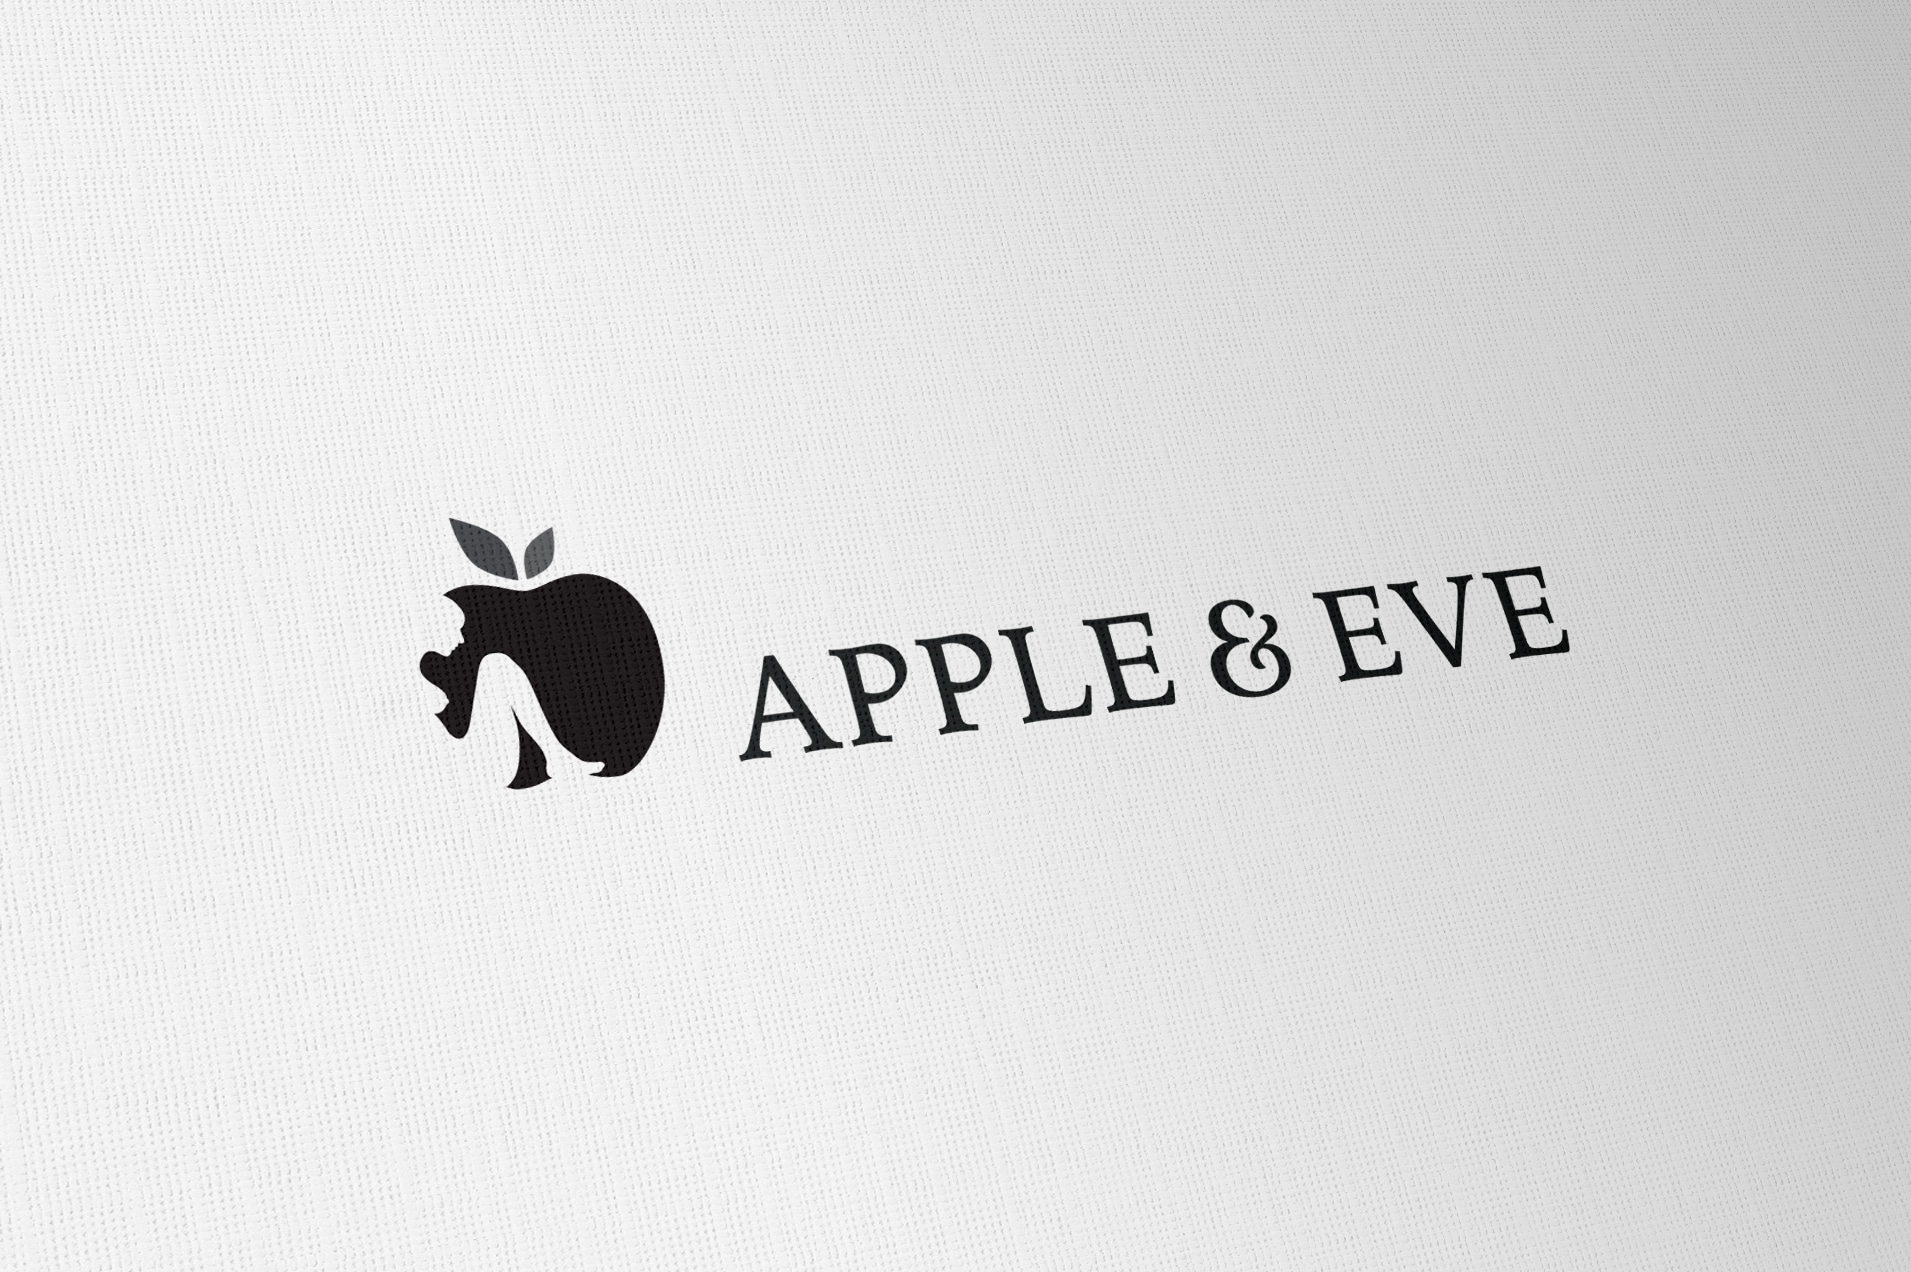 Apple & Eve Logo Designed By The Logo Smith